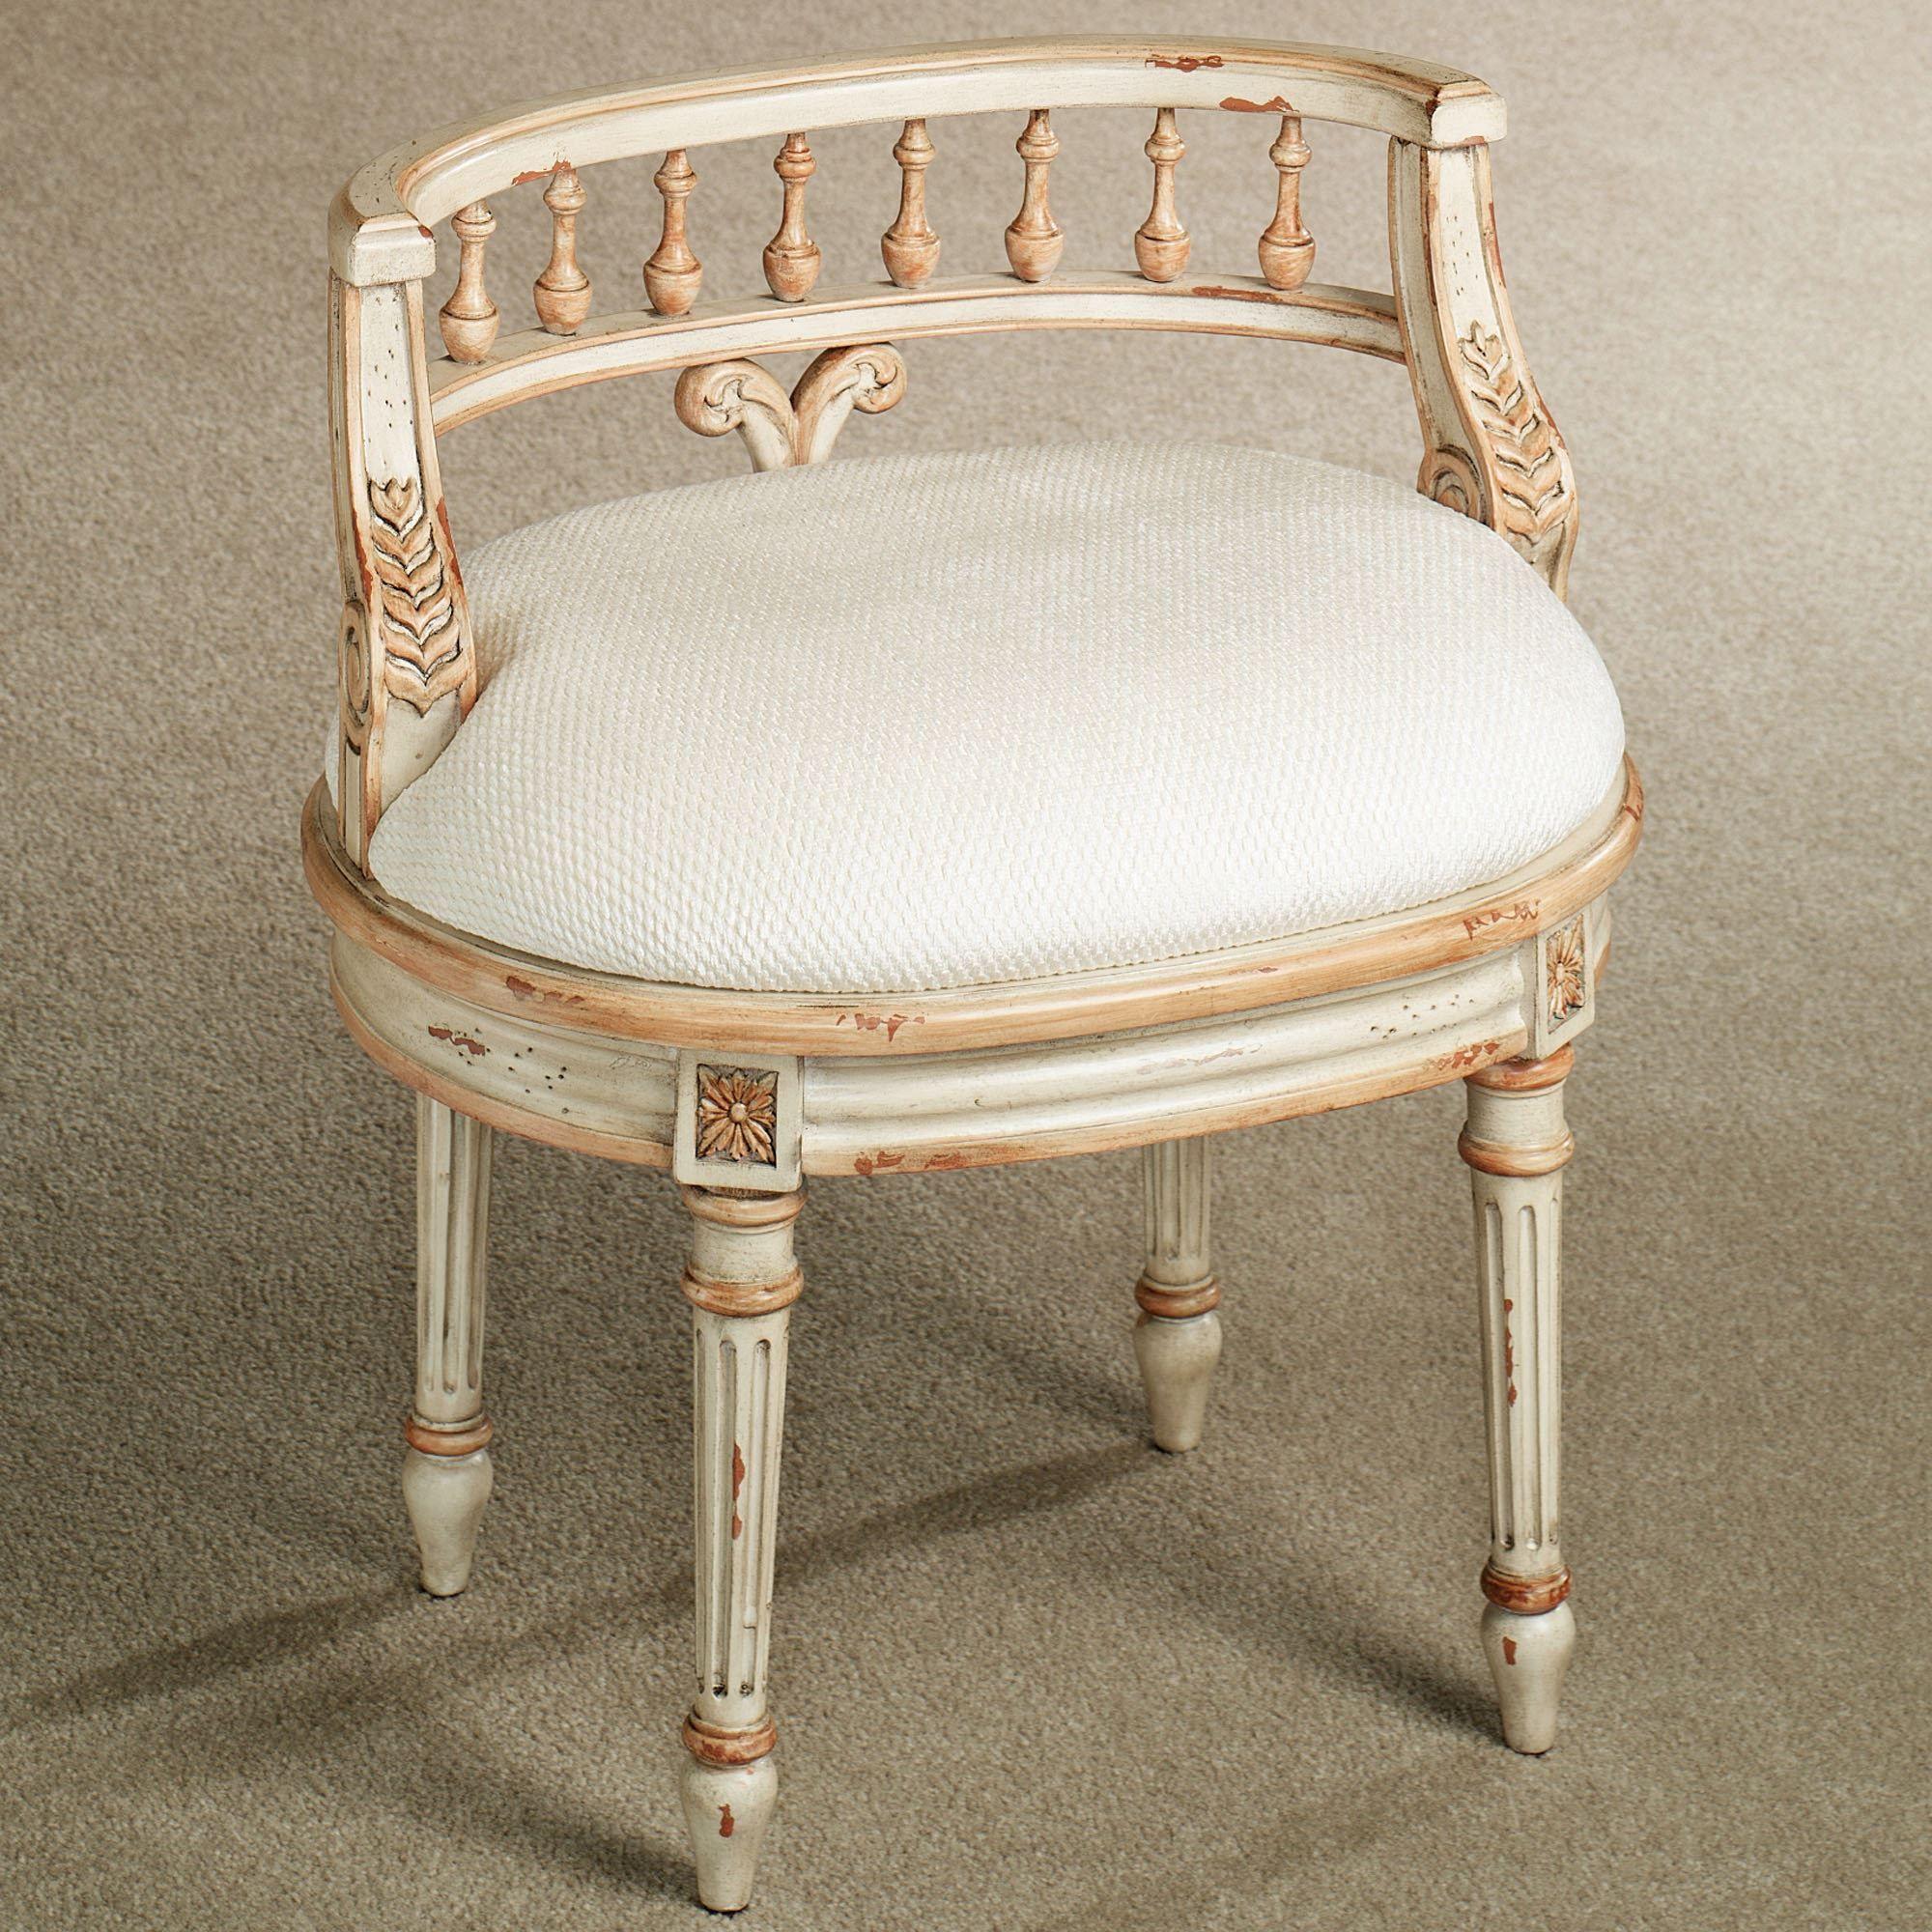 Queensley Upholstered Antique Ivory Vanity Chair